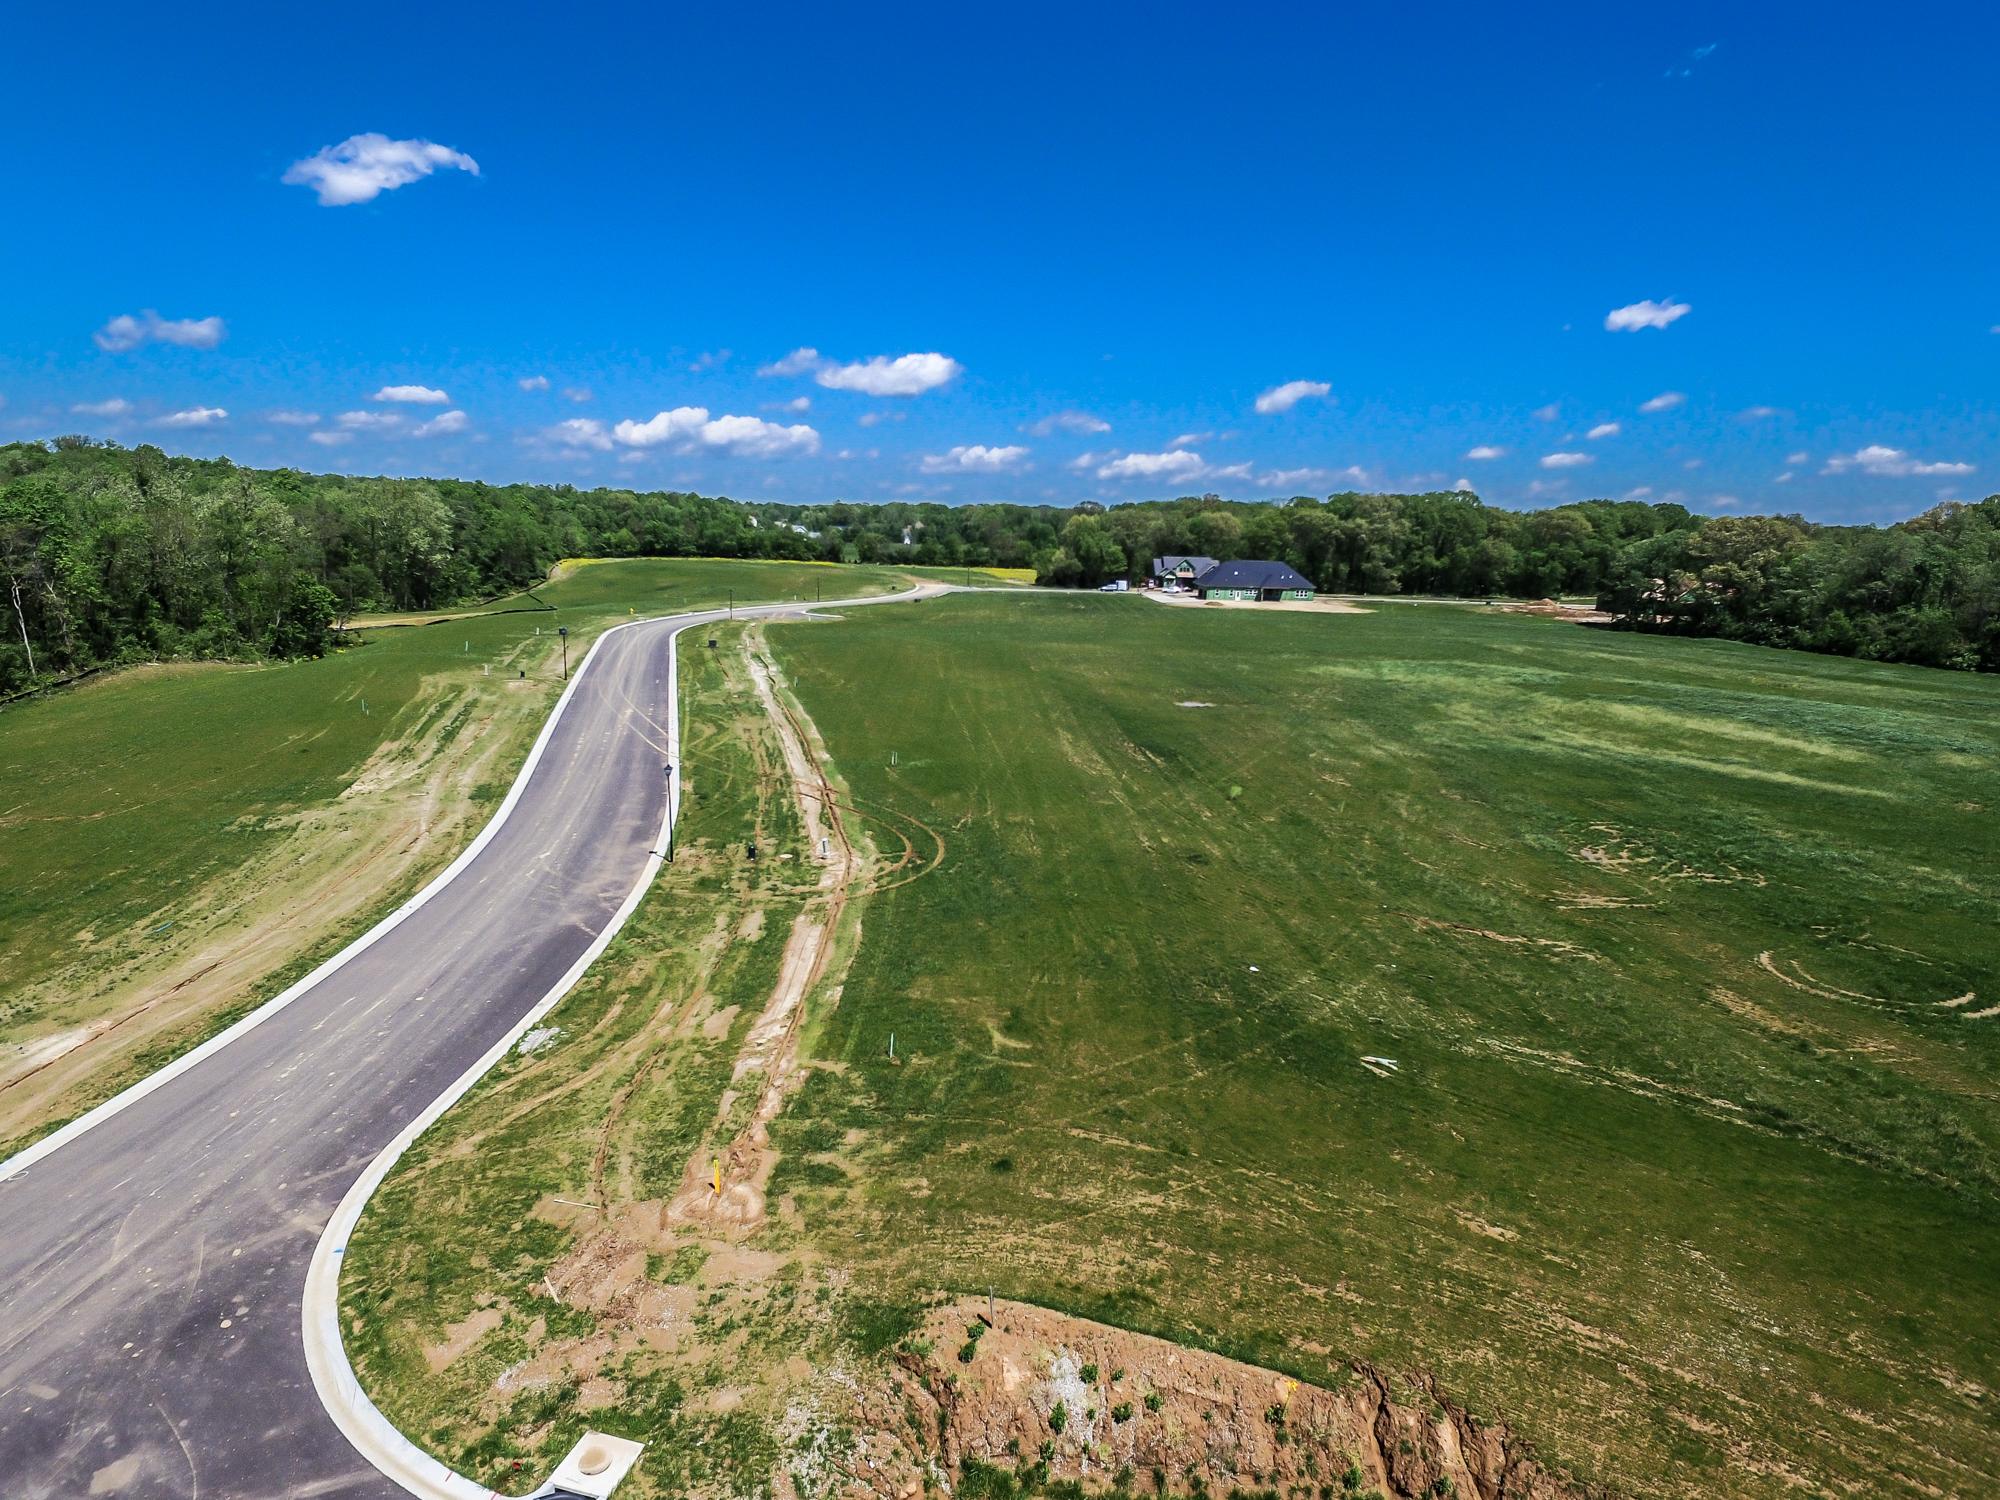 Bethel_Ridge_Farms_O'Fallon_Illinois_Aerials_Progress_5.3.17-16.jpg